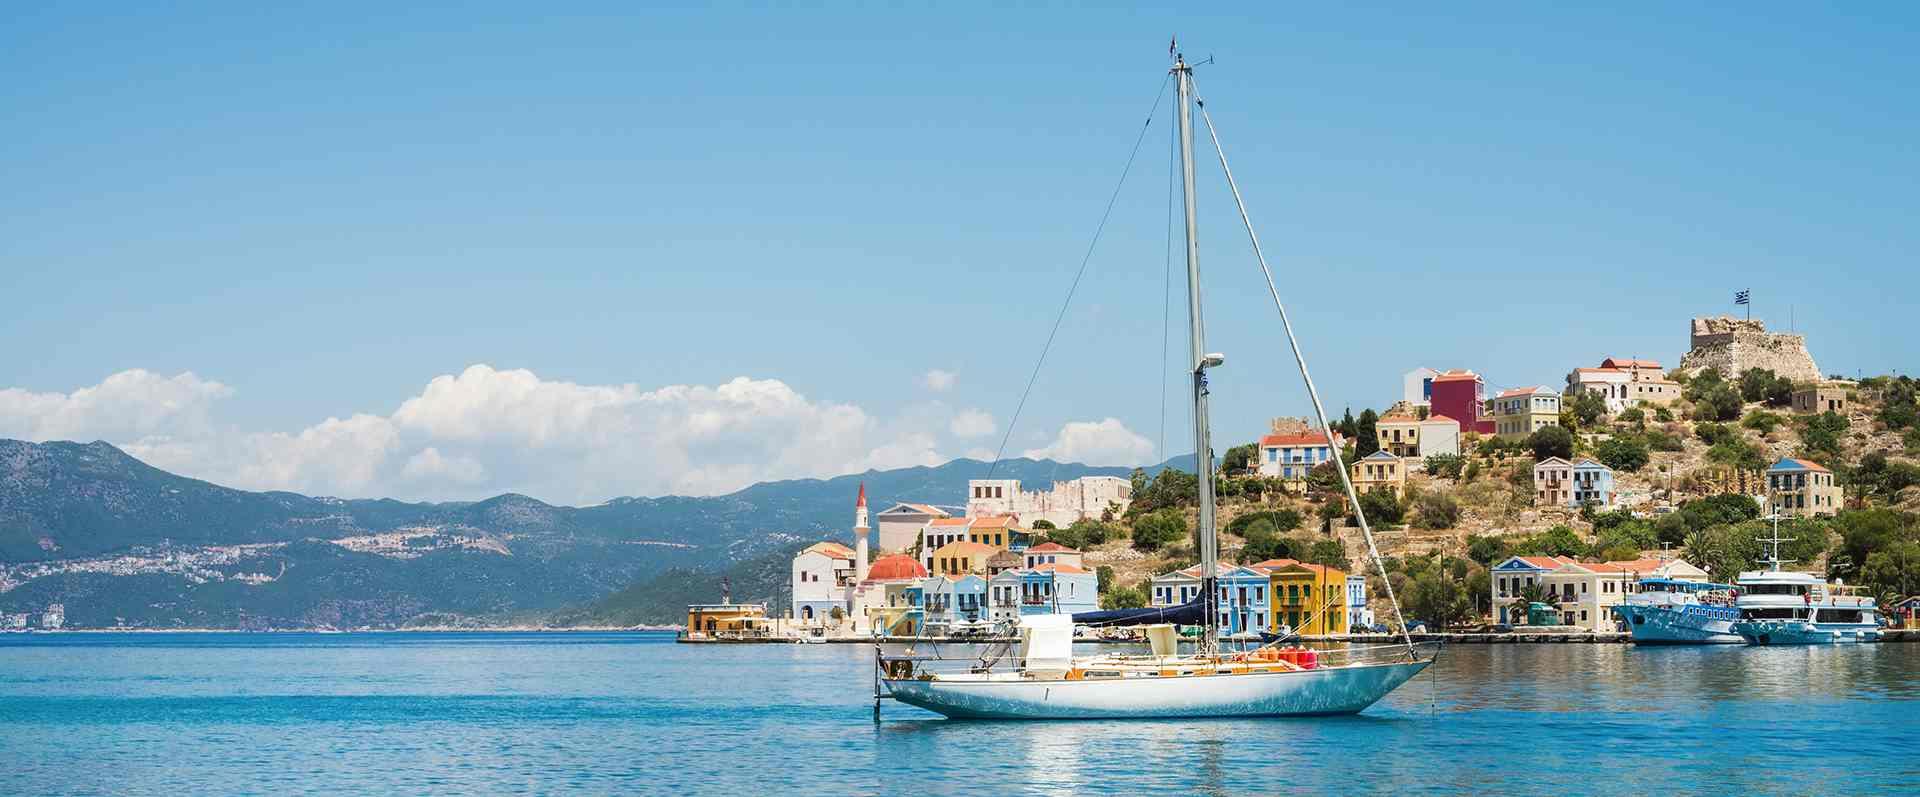 yacht-in-bay-of-kastelorizo-island-dodecanese